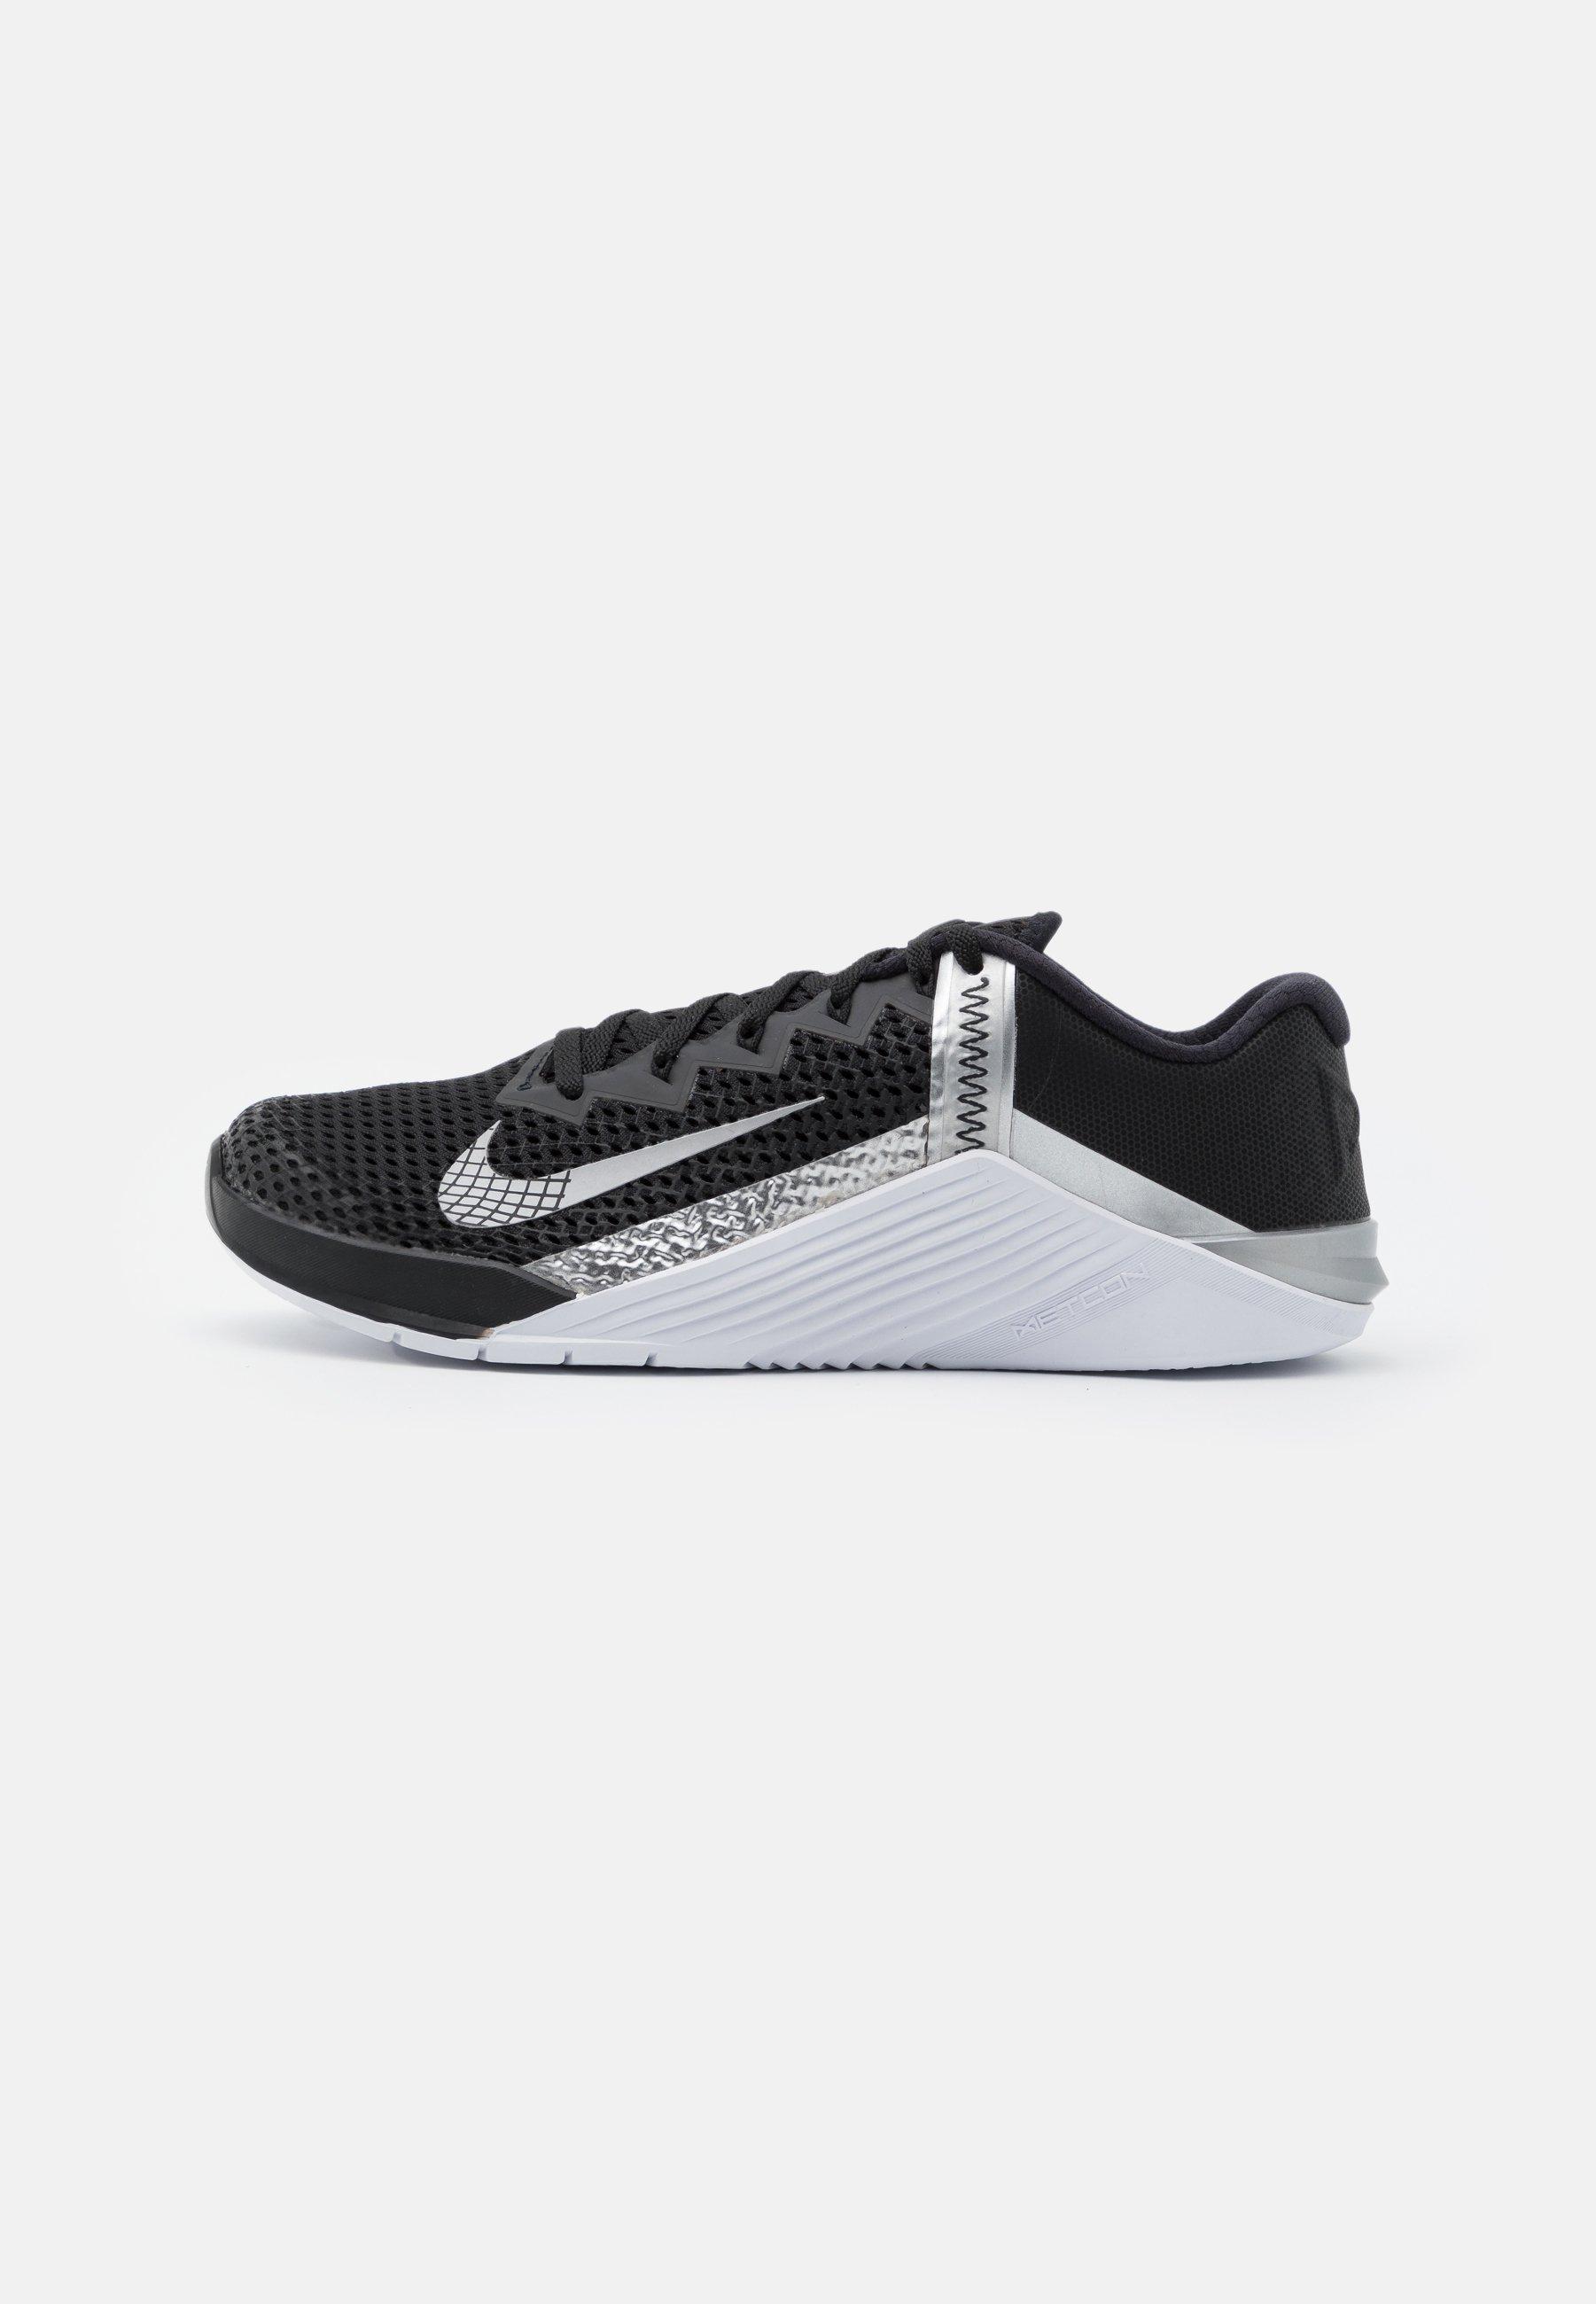 Adentro pronunciación bestia  Nike Performance METCON 6 - Sports shoes - black/metallic silver - Zalando .ie